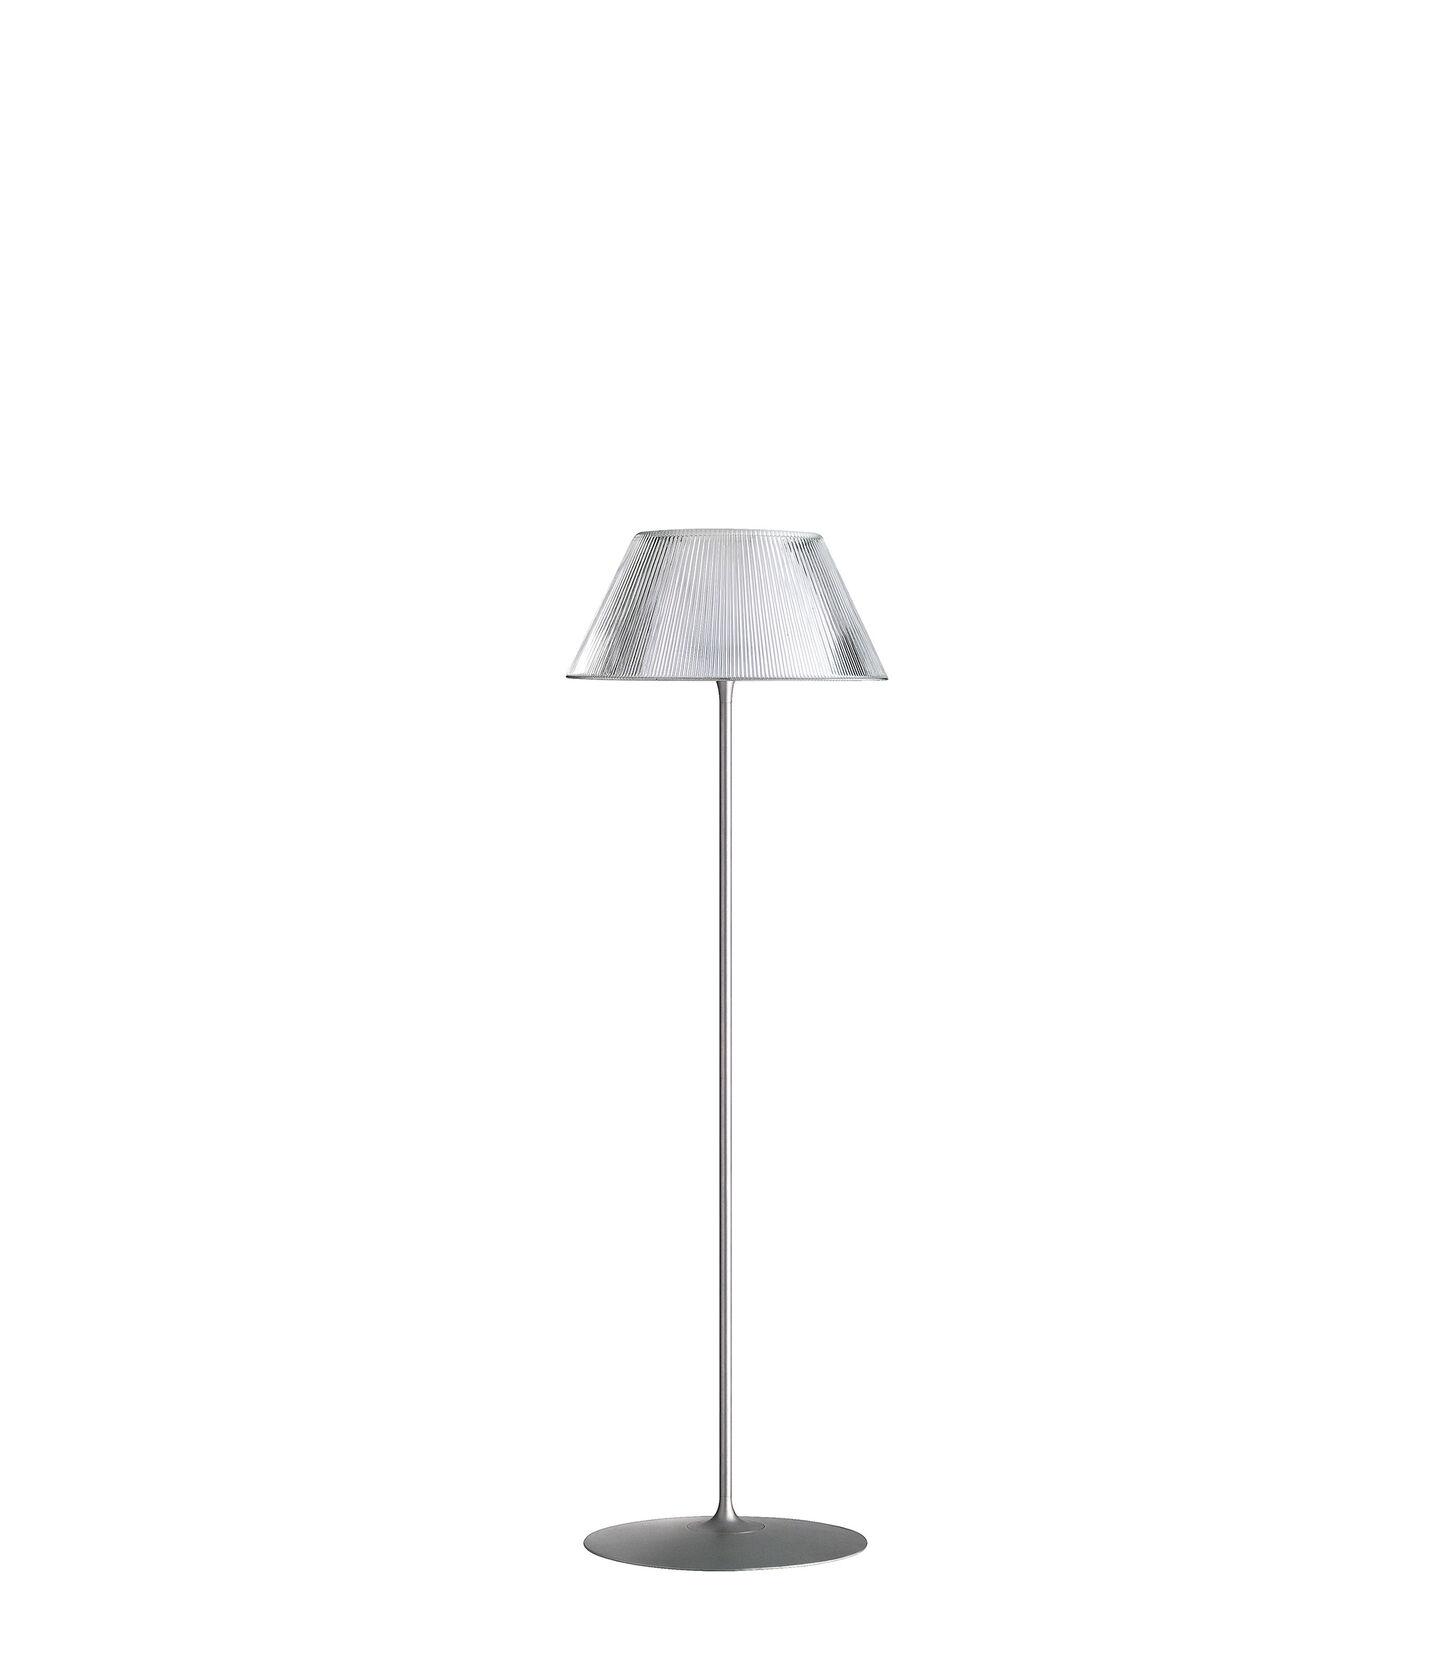 romeo-moon-floor-starck-flos-F6109000-product-still-life-big-2